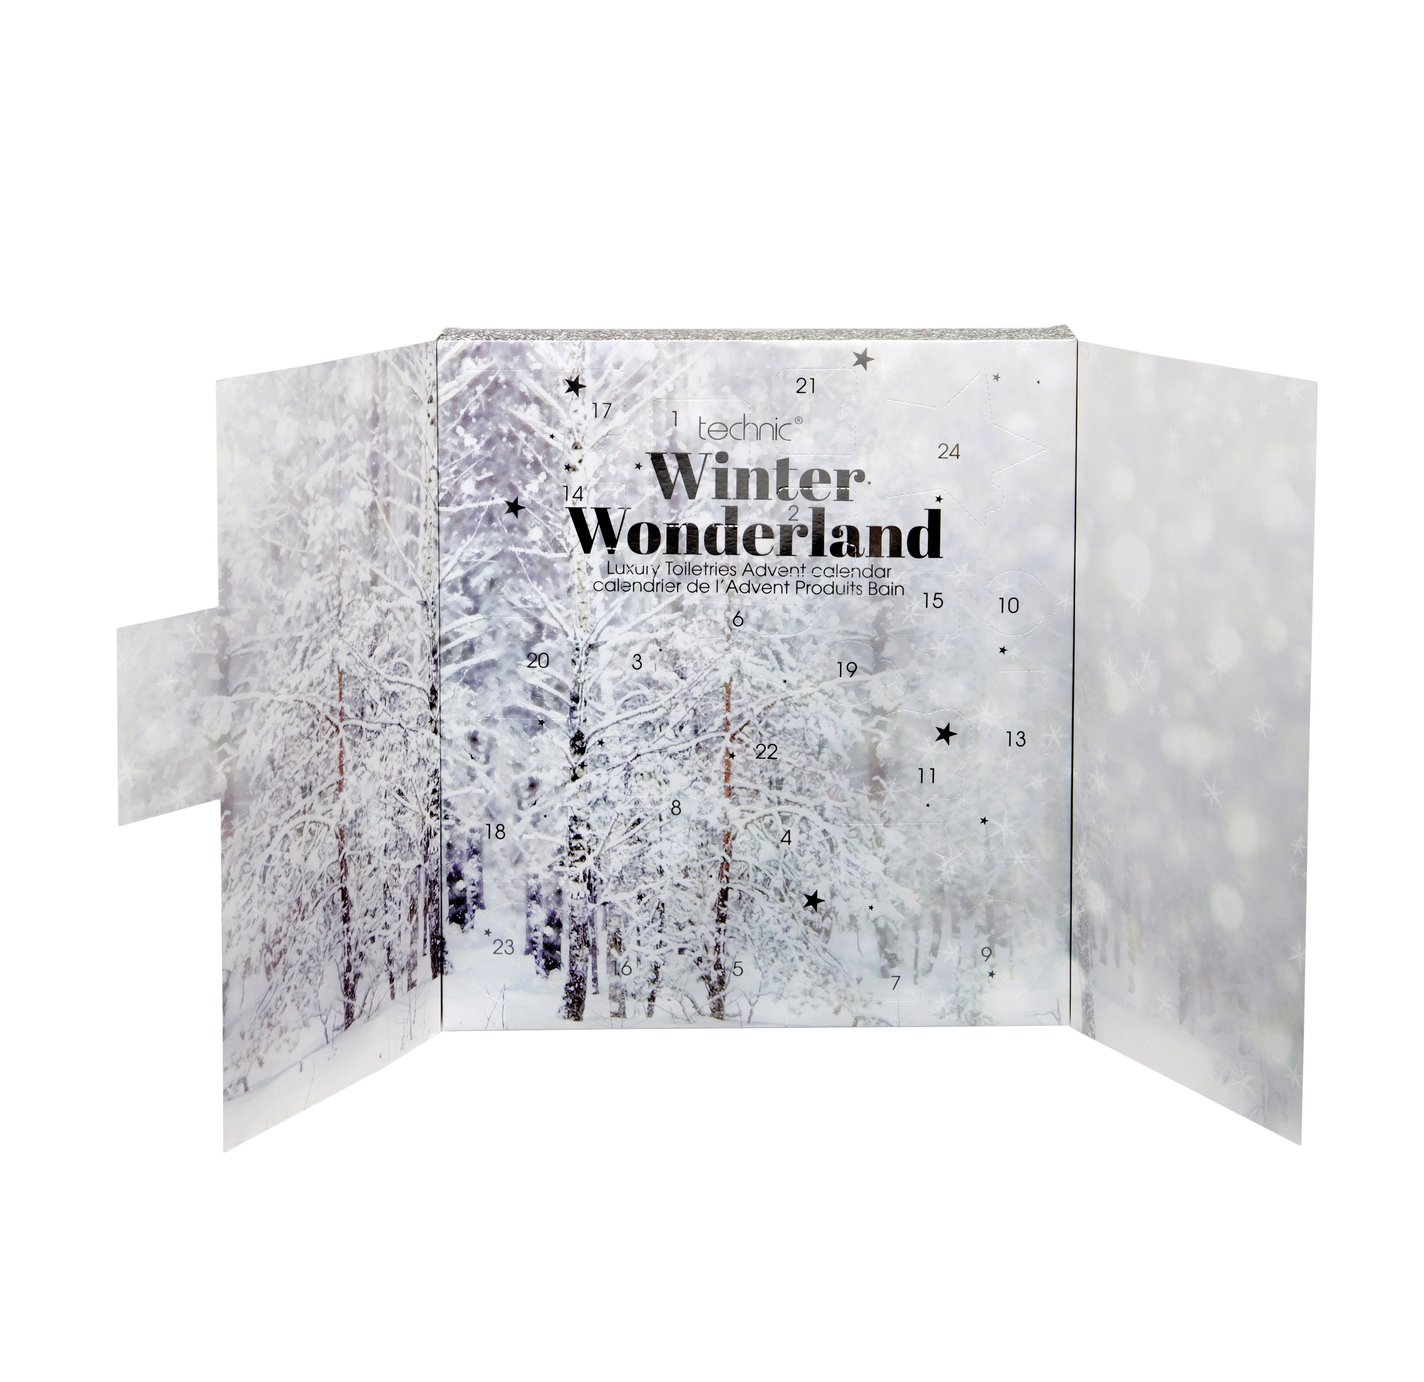 Technic Winter Wonderland 24 Day Luxury Advent Calendar